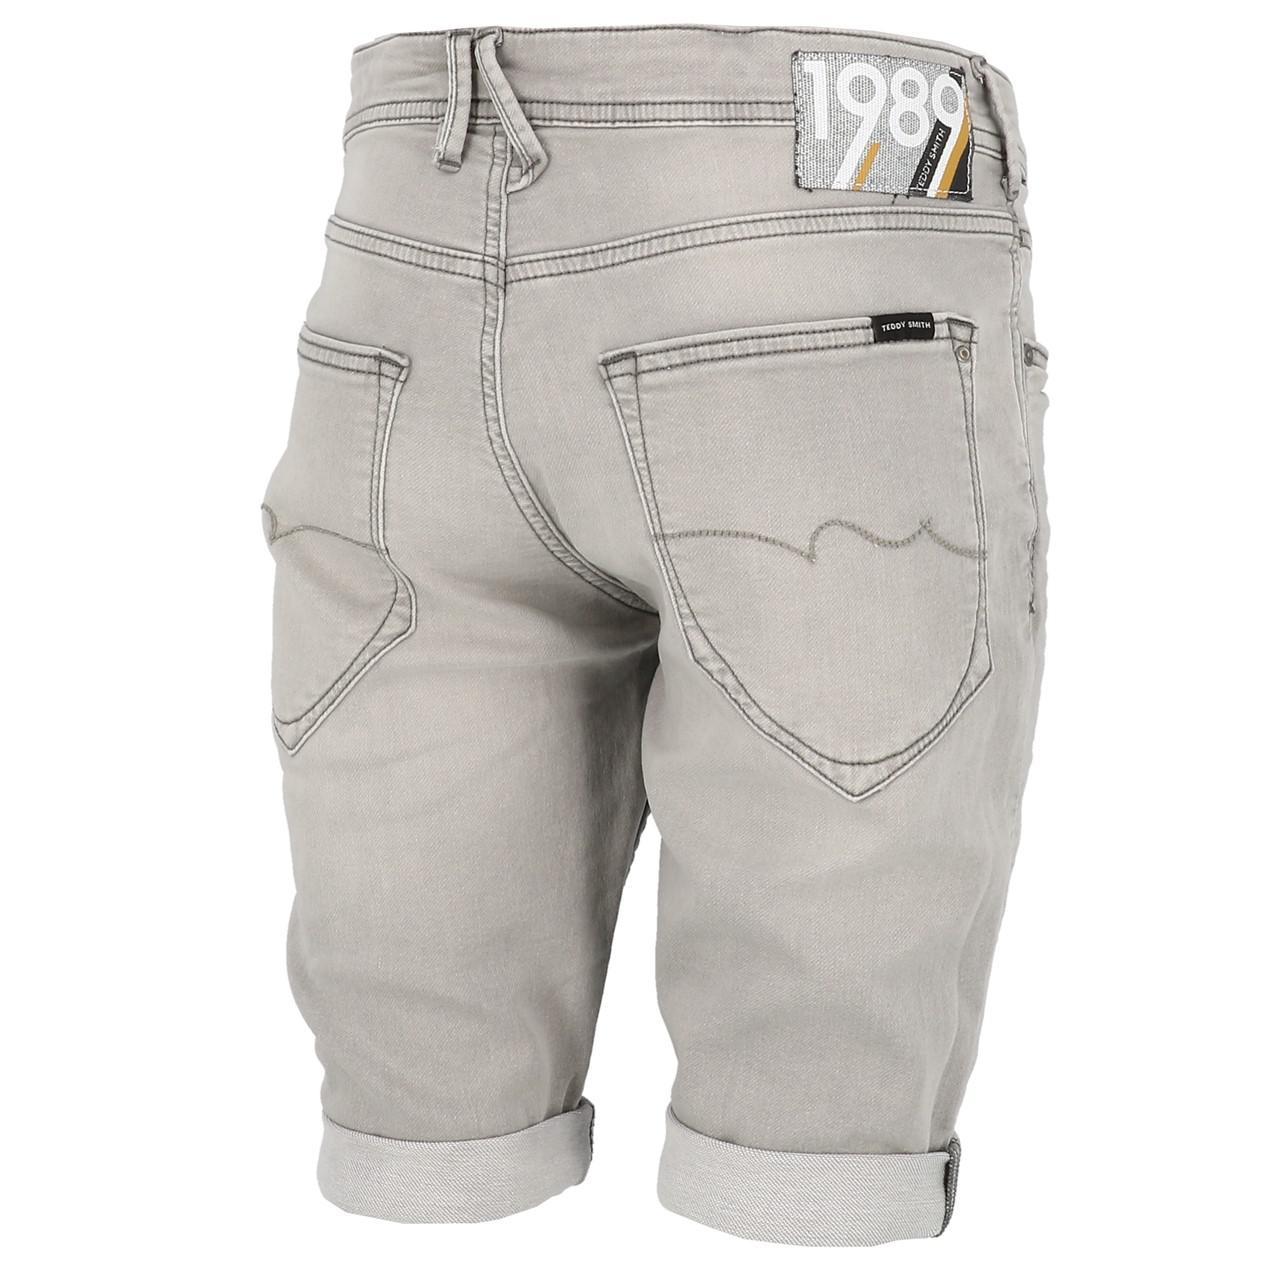 Bermuda-Shorts-Teddy-smith-Scotty-3-Grey-Shorts-Grey-29920-New thumbnail 5